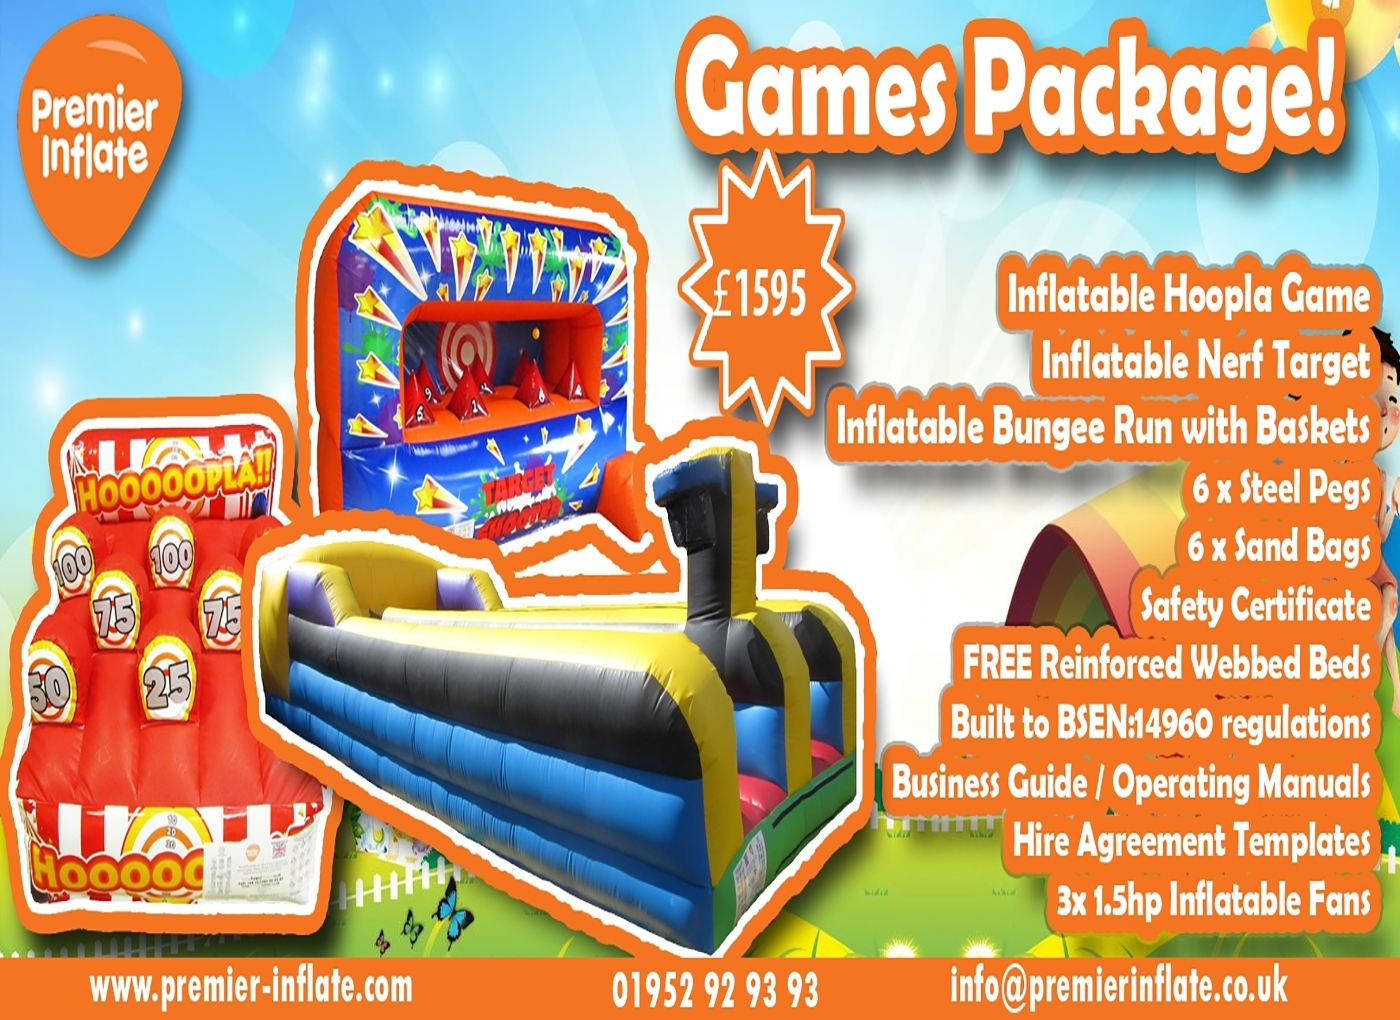 Games Package